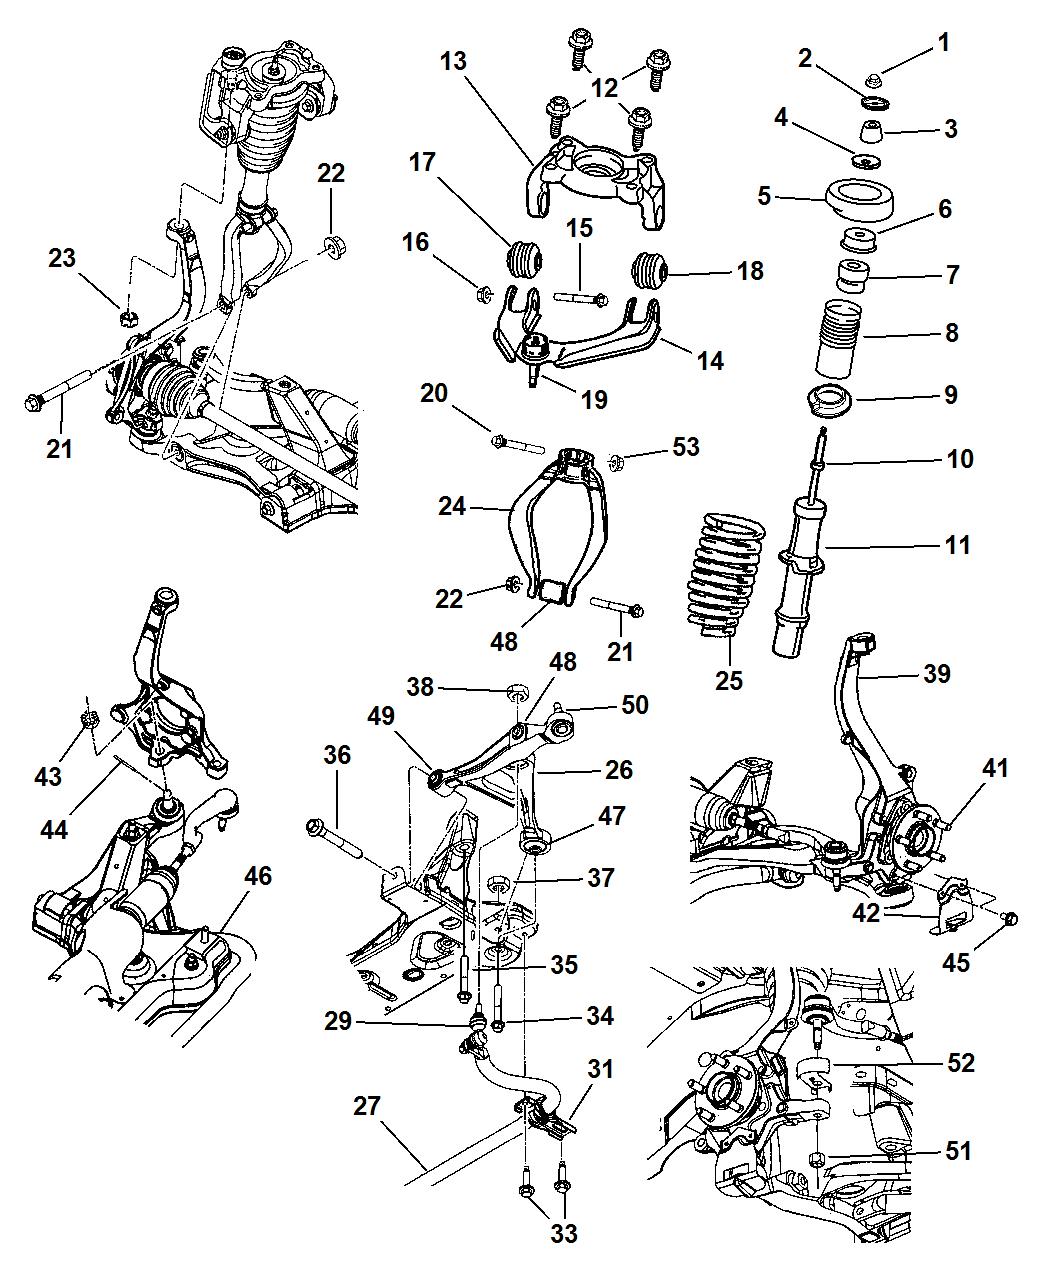 dodge parts diagram 2002 dodge stratus rear suspension diagram wiring diagram data  2002 dodge stratus rear suspension